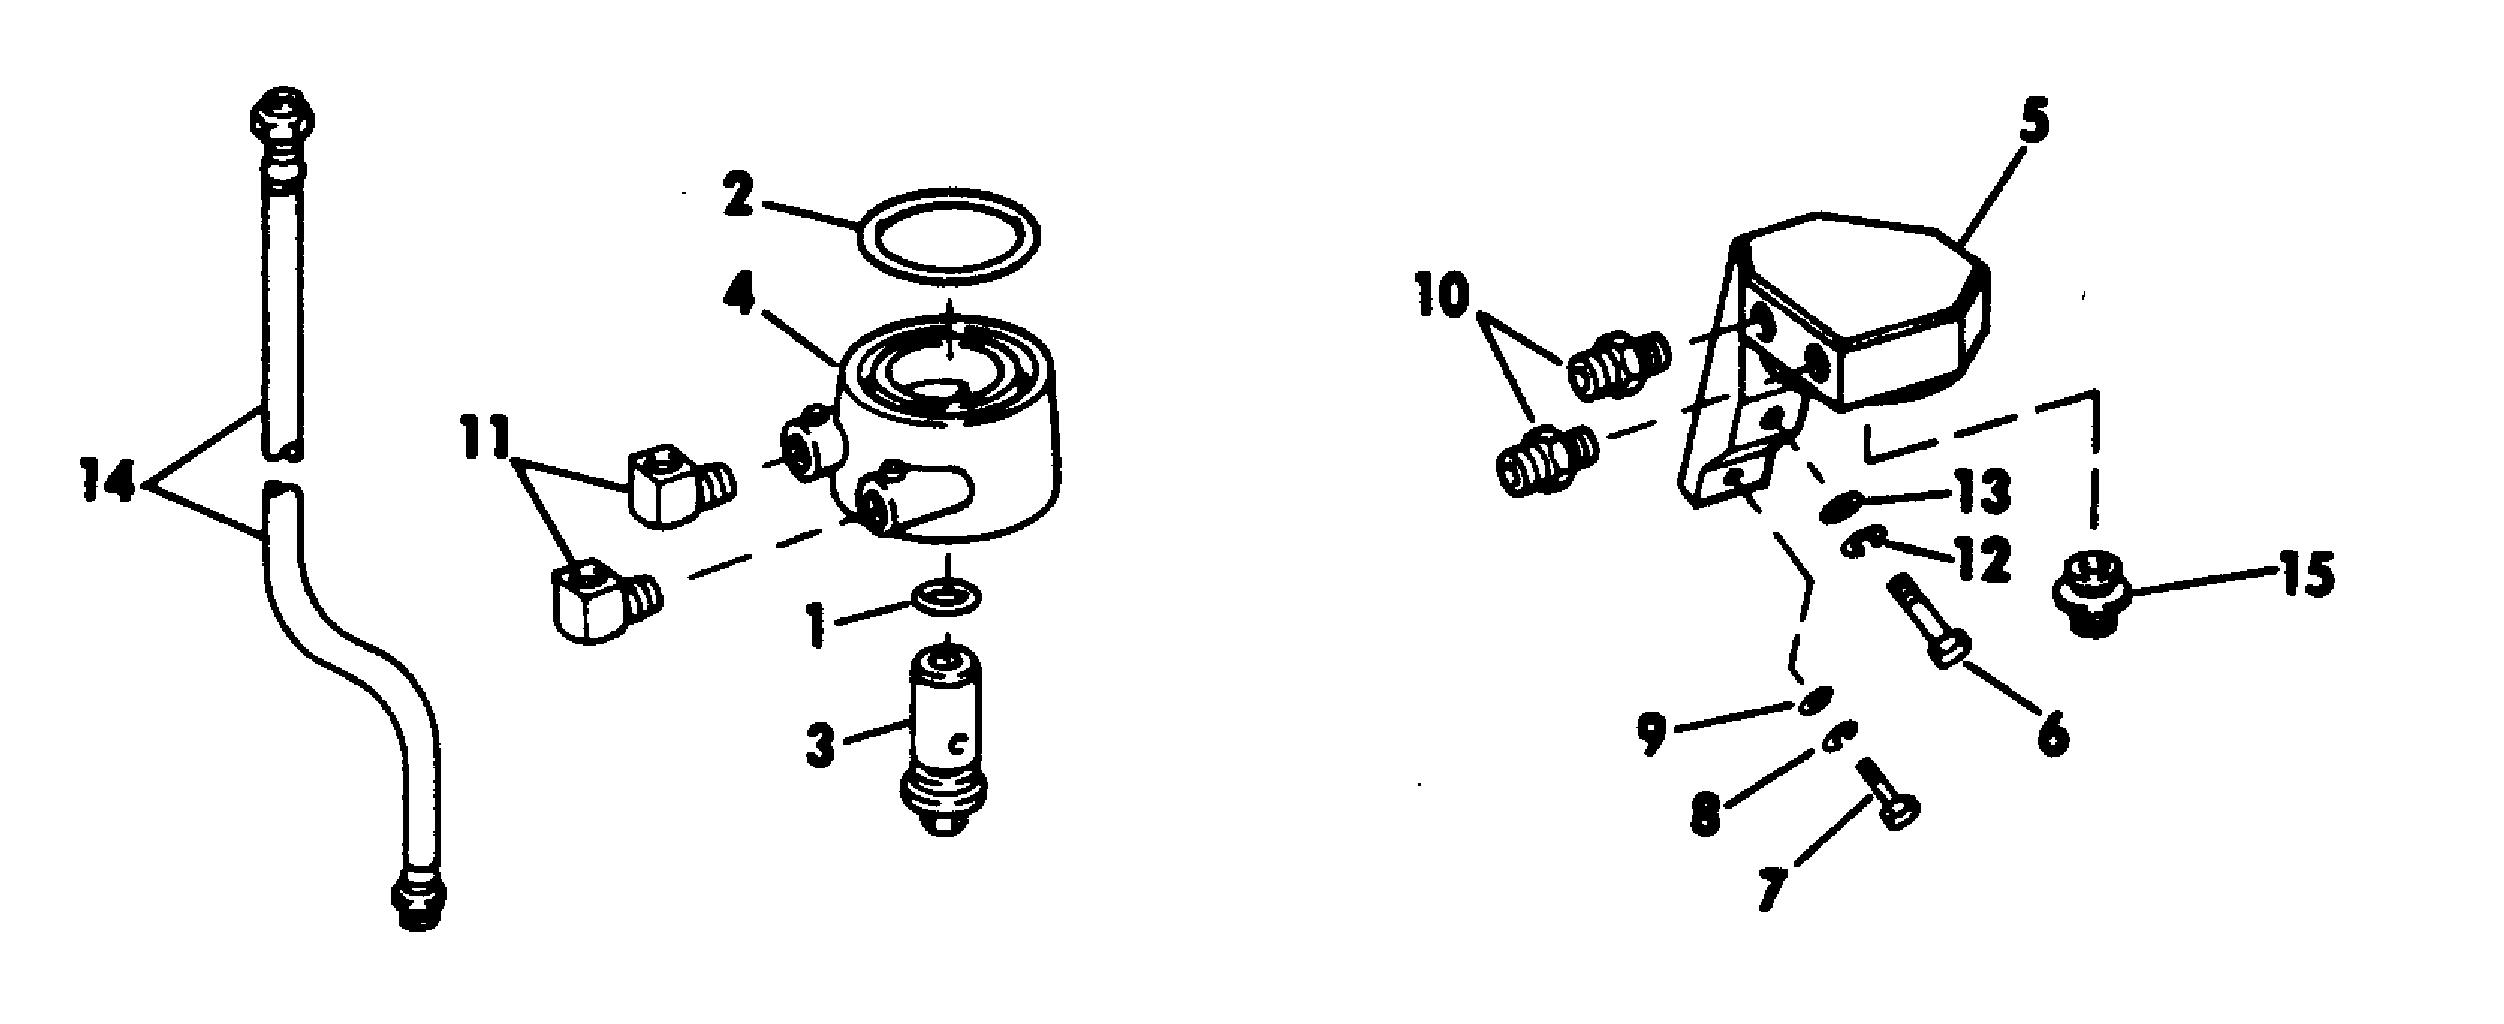 Remote Oil Filter Kit